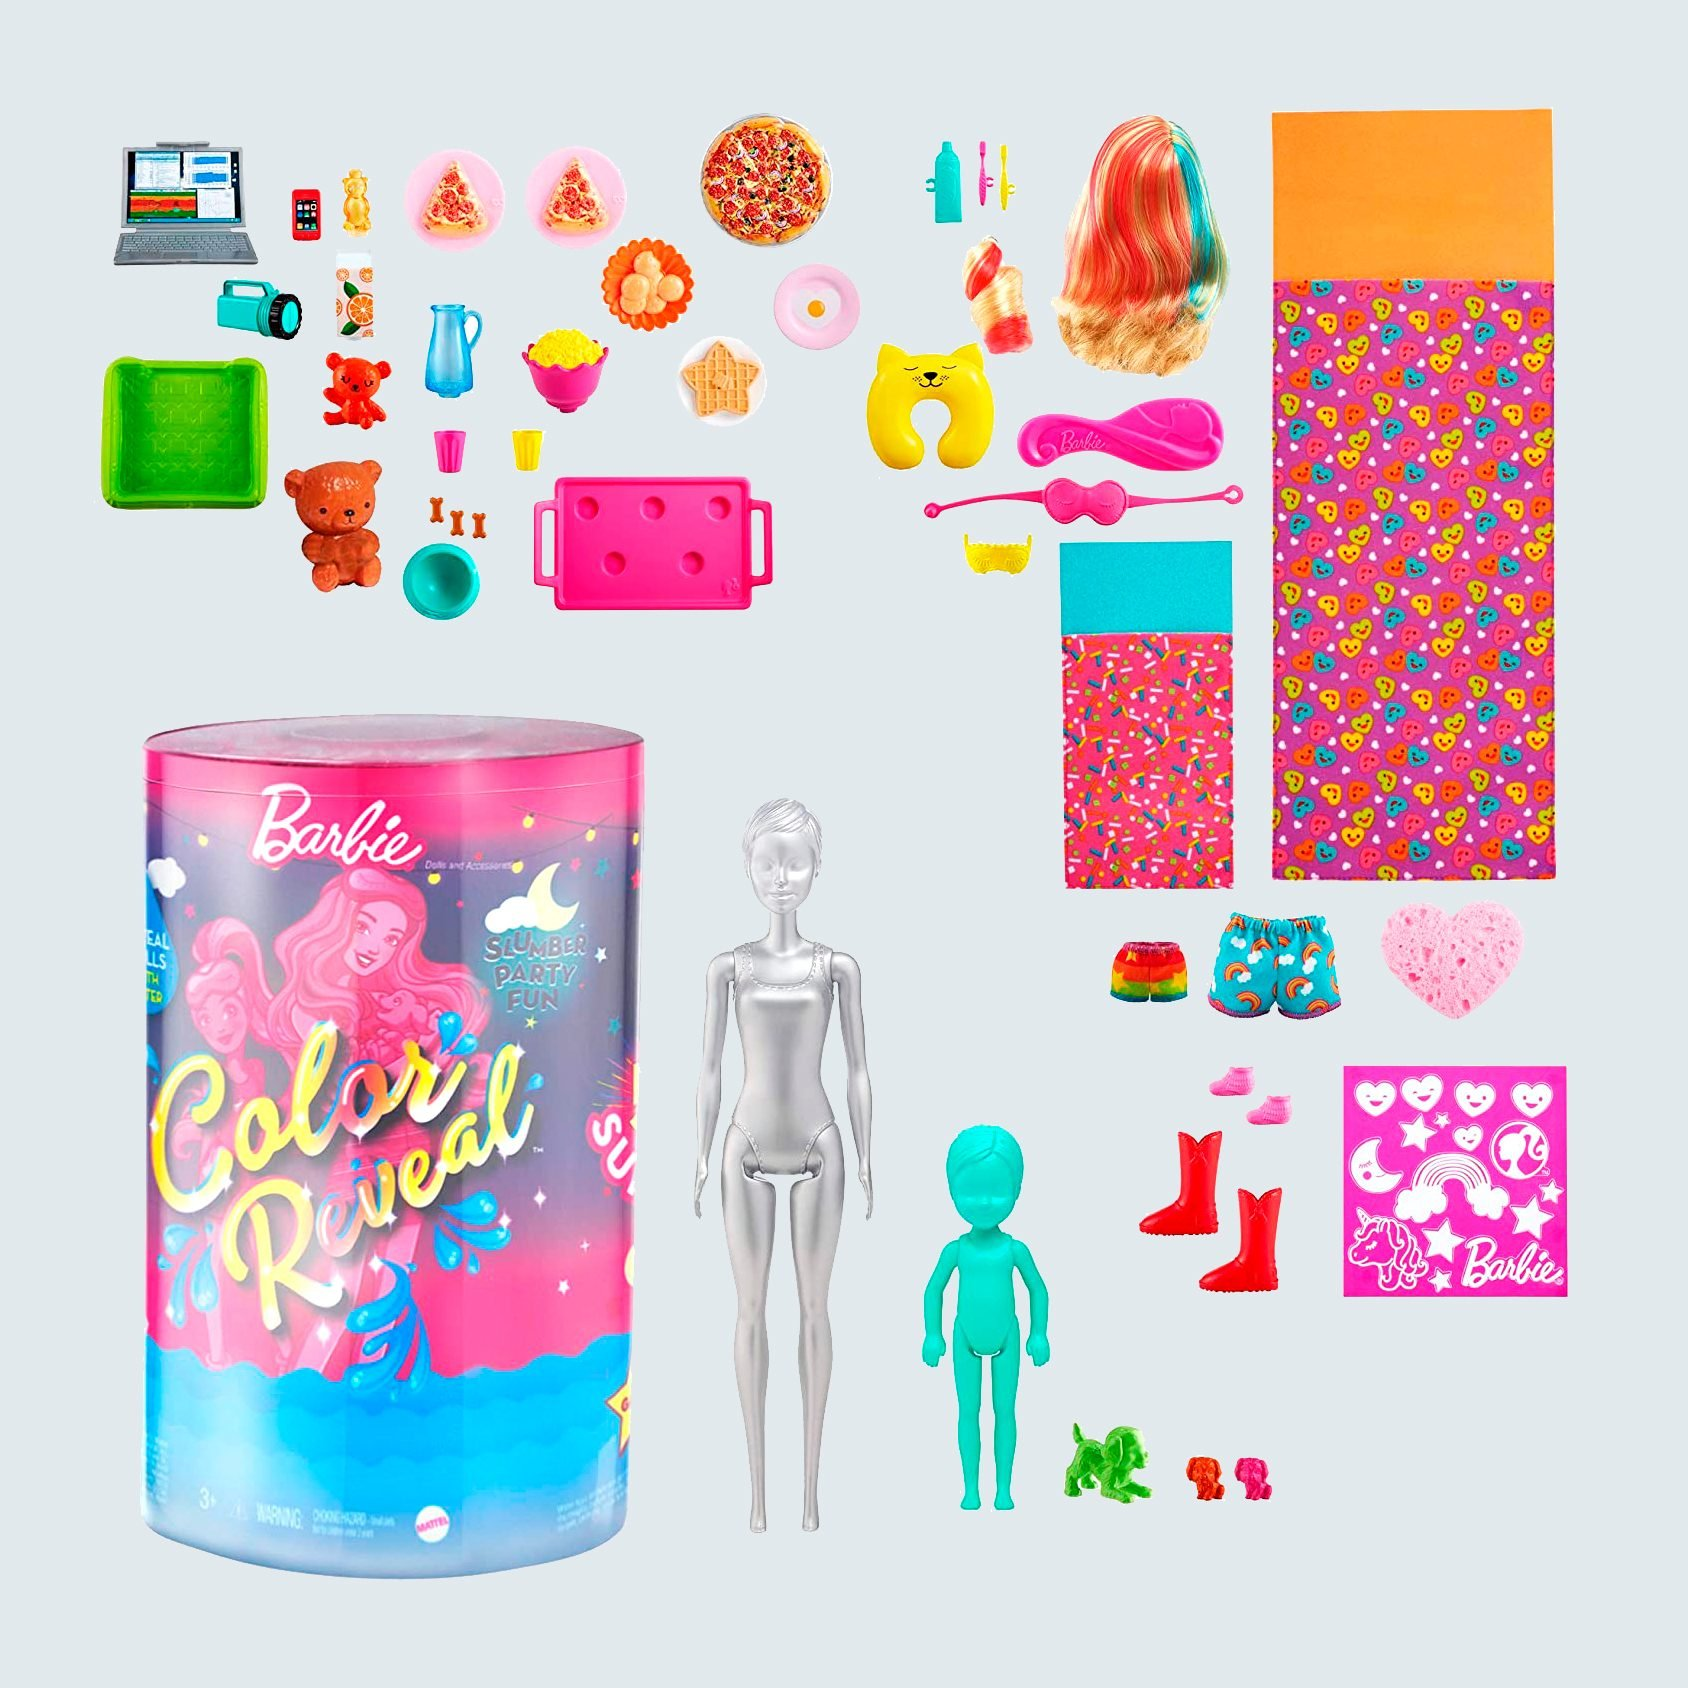 Barbie Color Reveal Slumber Party